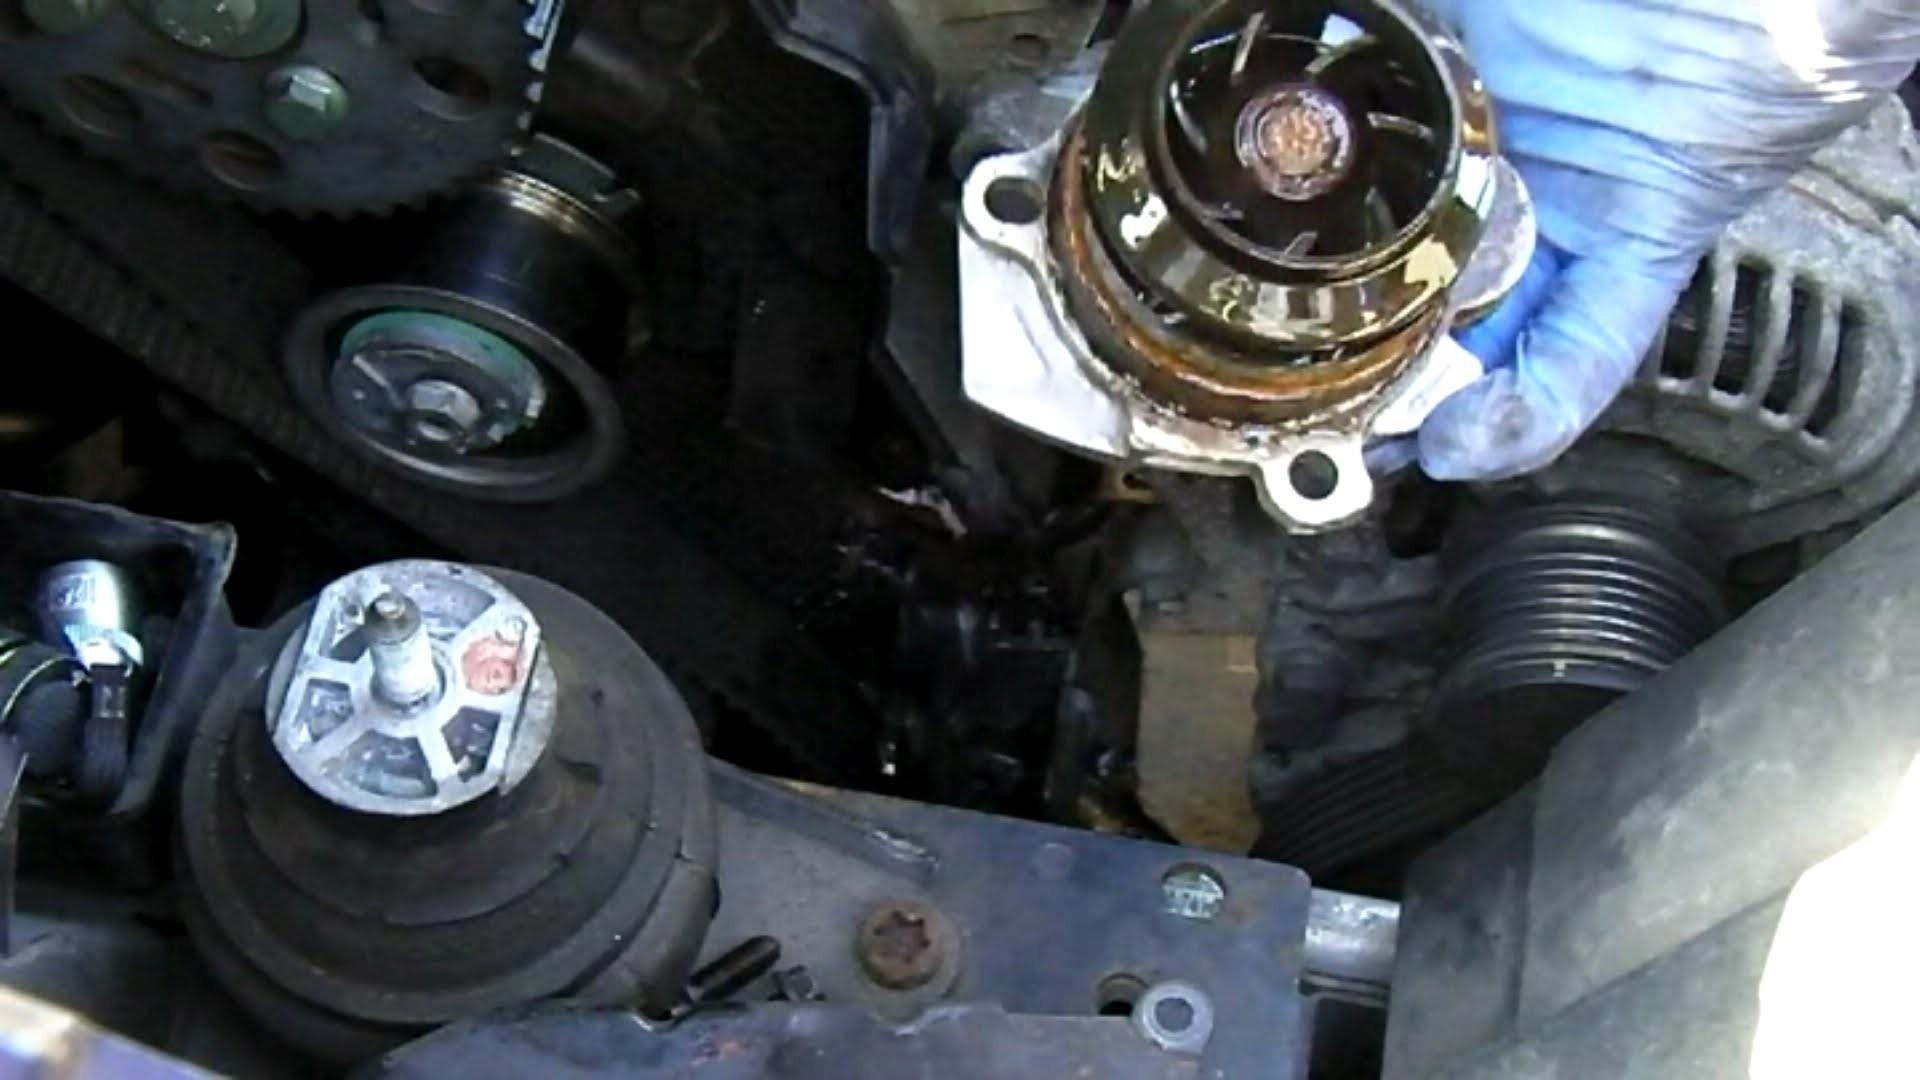 Diagram Of Car Water Pump ford Galaxy 1 9 Tdi Mk2 Water Pump Removal Of Diagram Of Car Water Pump How to Change Engine Timing Belt Dodge Intrepid 3 5l 95 97 Part 2